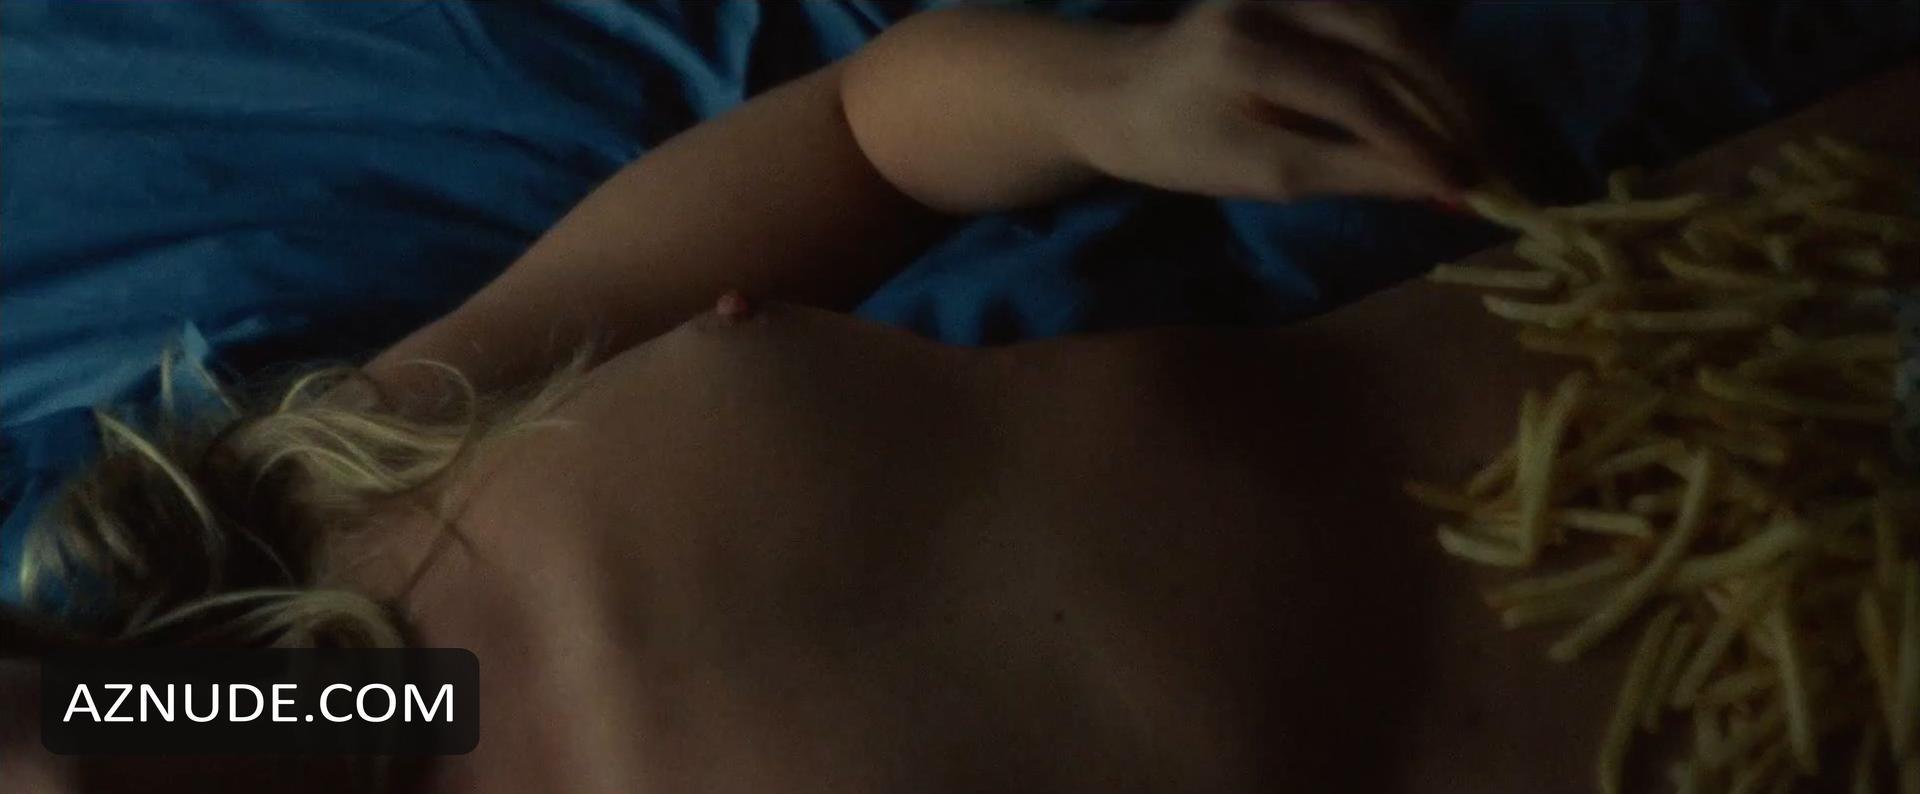 The Great Undressing Nude Scenes - Aznude-5450